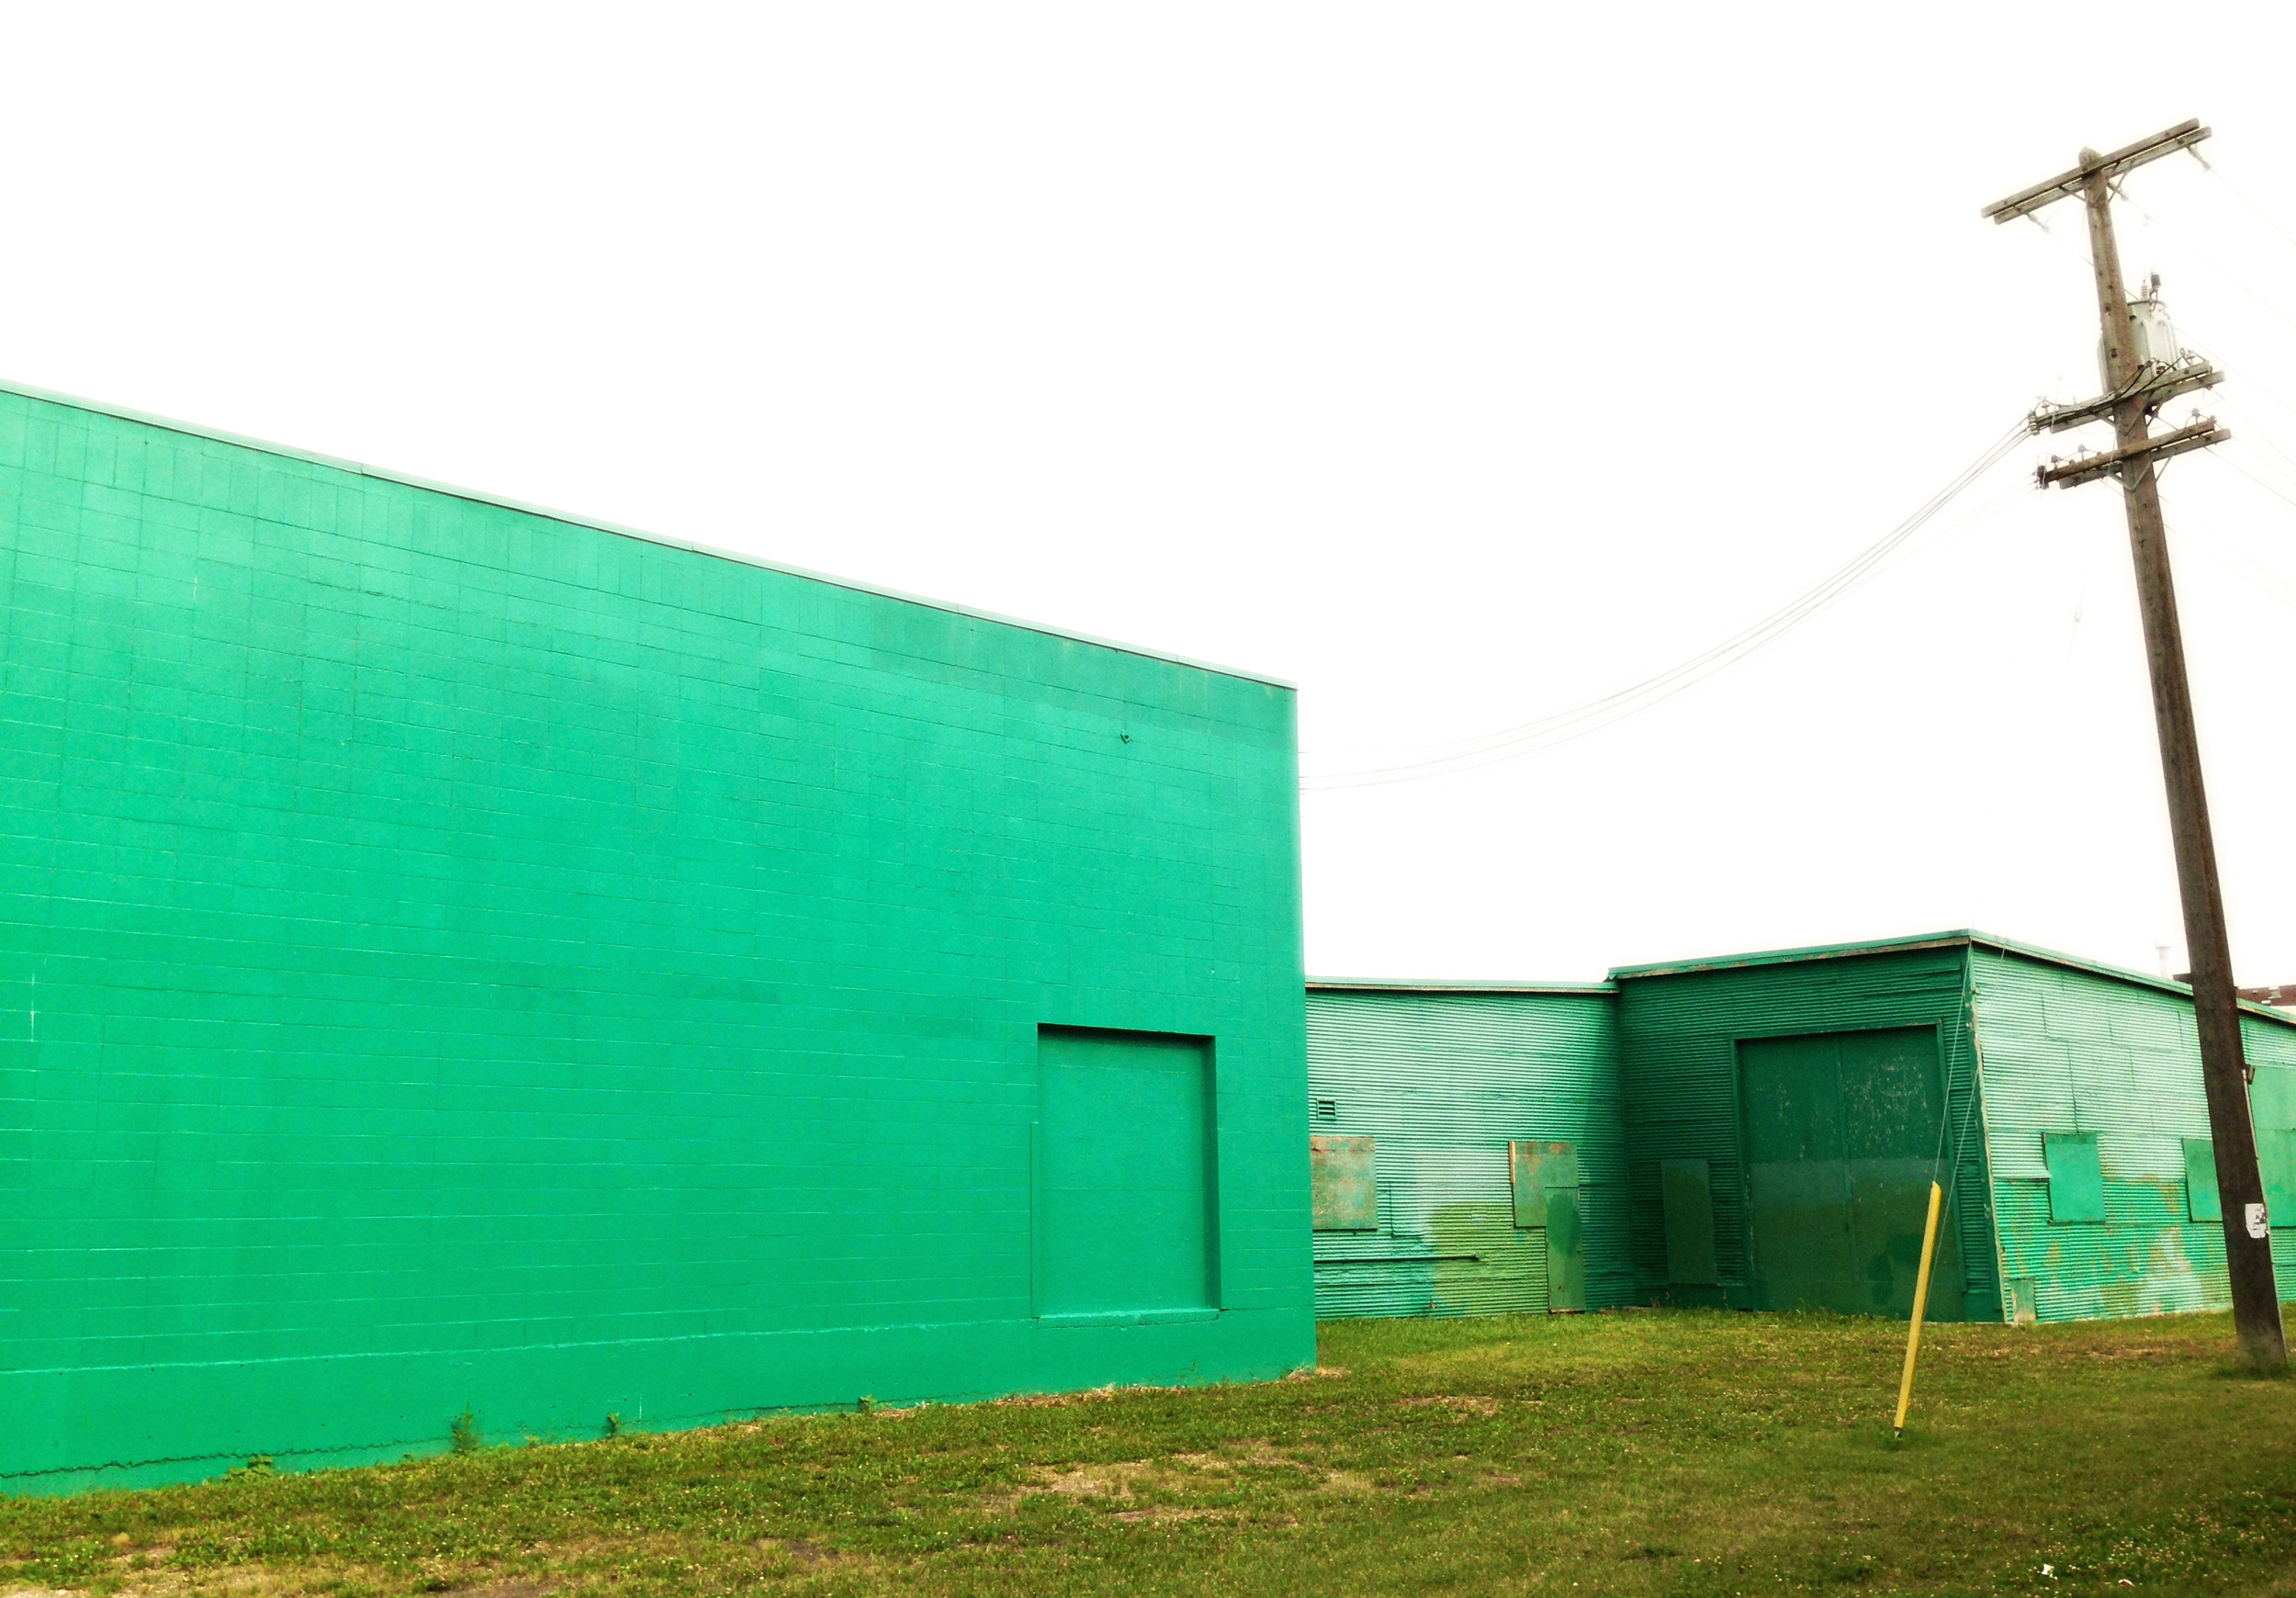 Green Building  121 Street @ 107 Ave, Edmonton, Alberta, VHS, August 2014